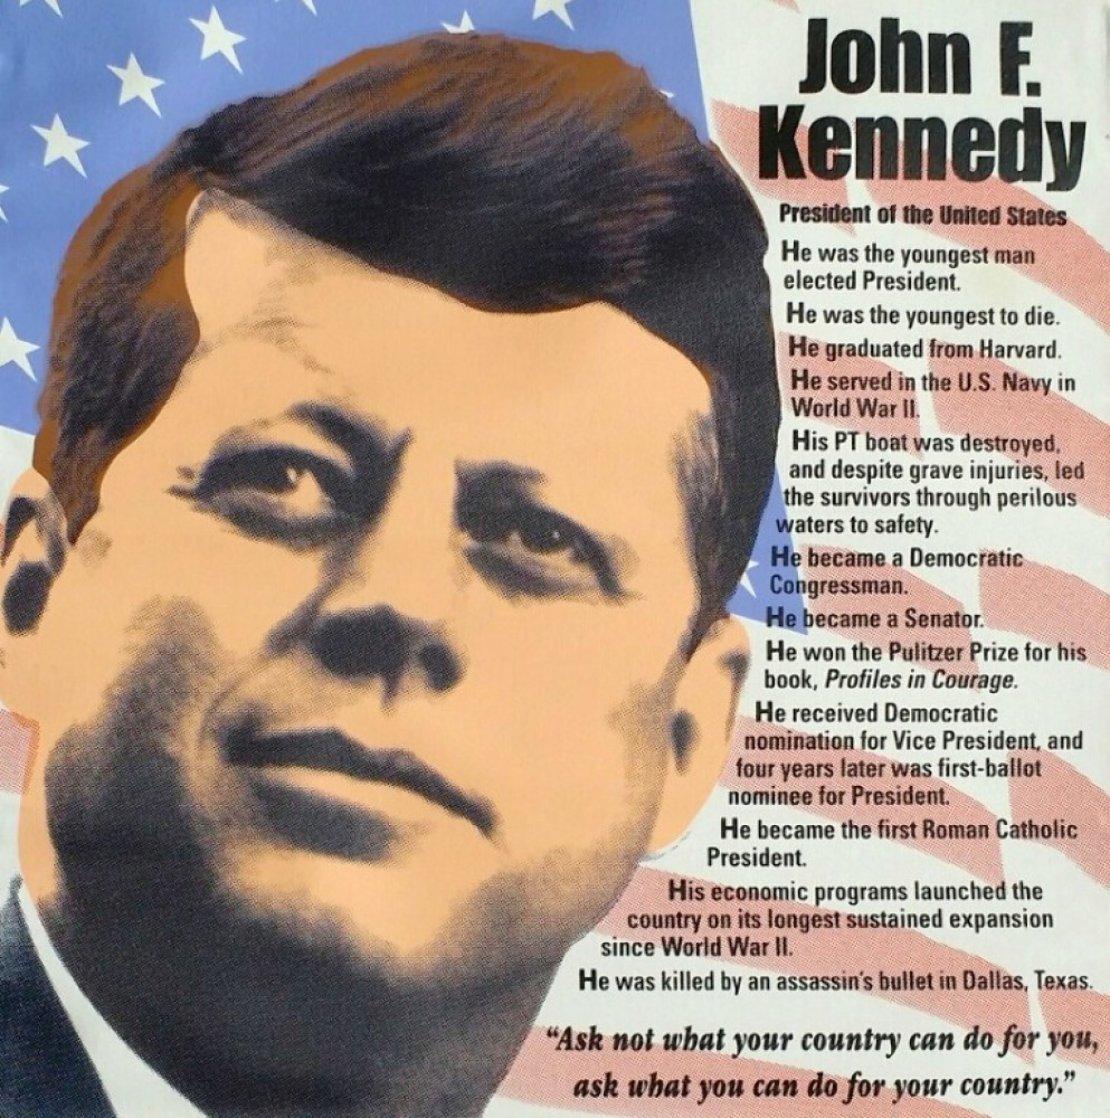 John F. Kennedy, Biography AP 2005 Limited Edition Print by Steve Kaufman